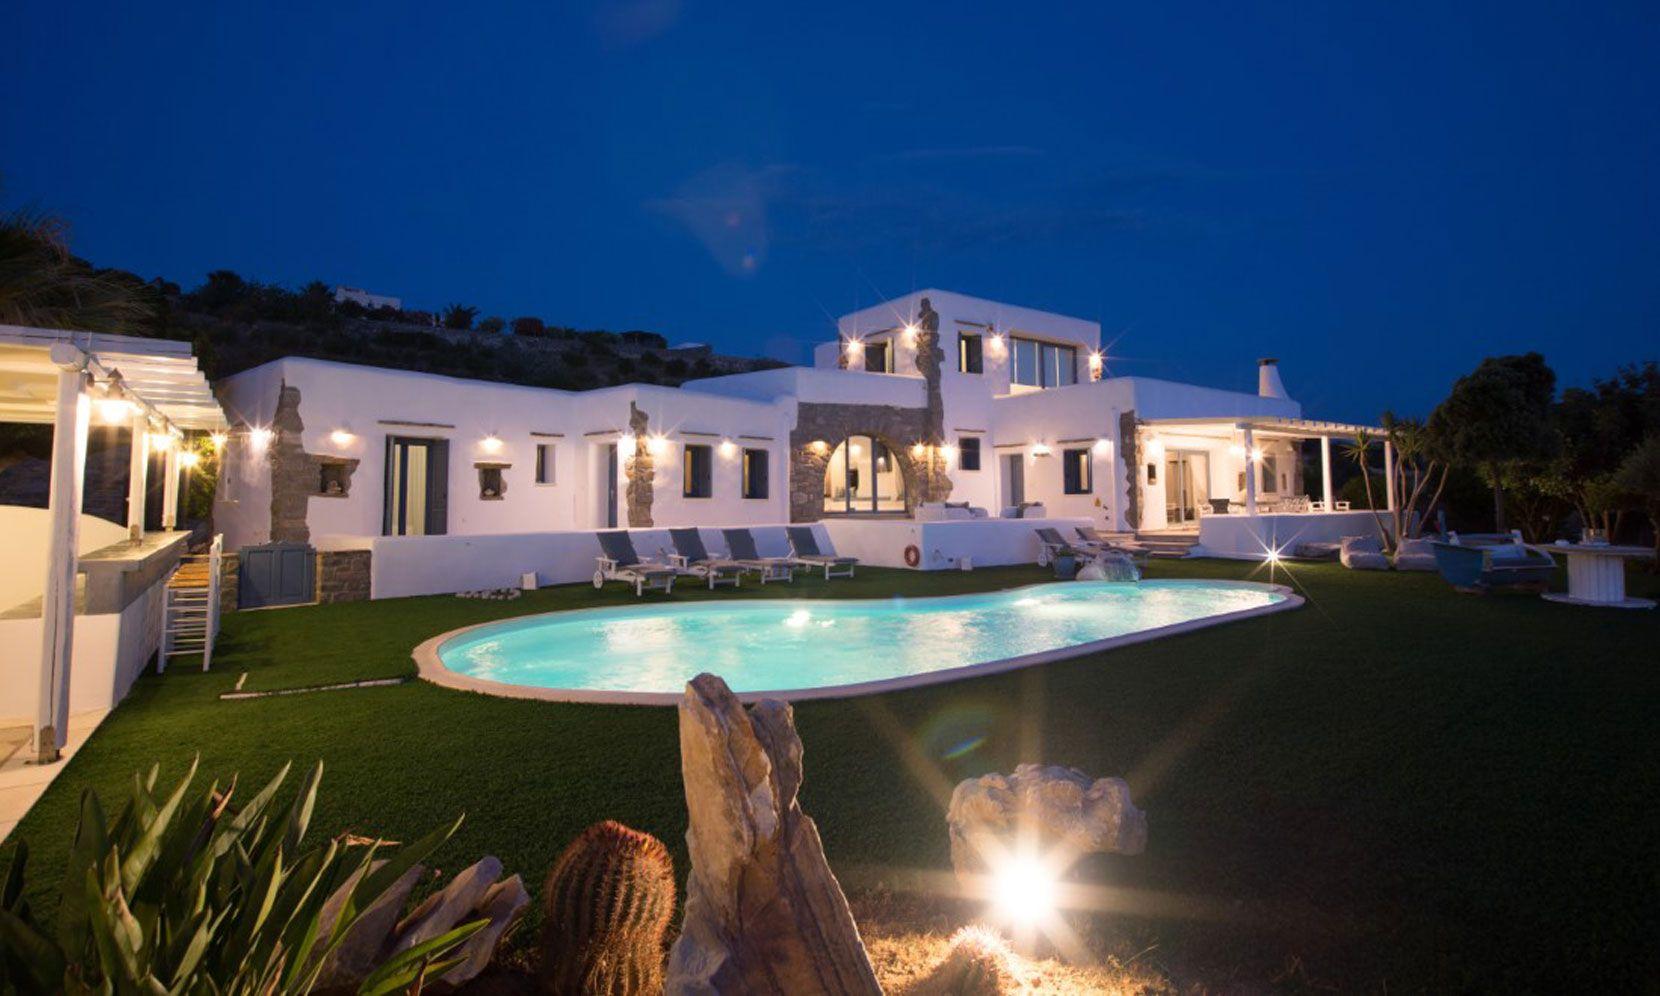 Paros Villa Selini jumbotron image